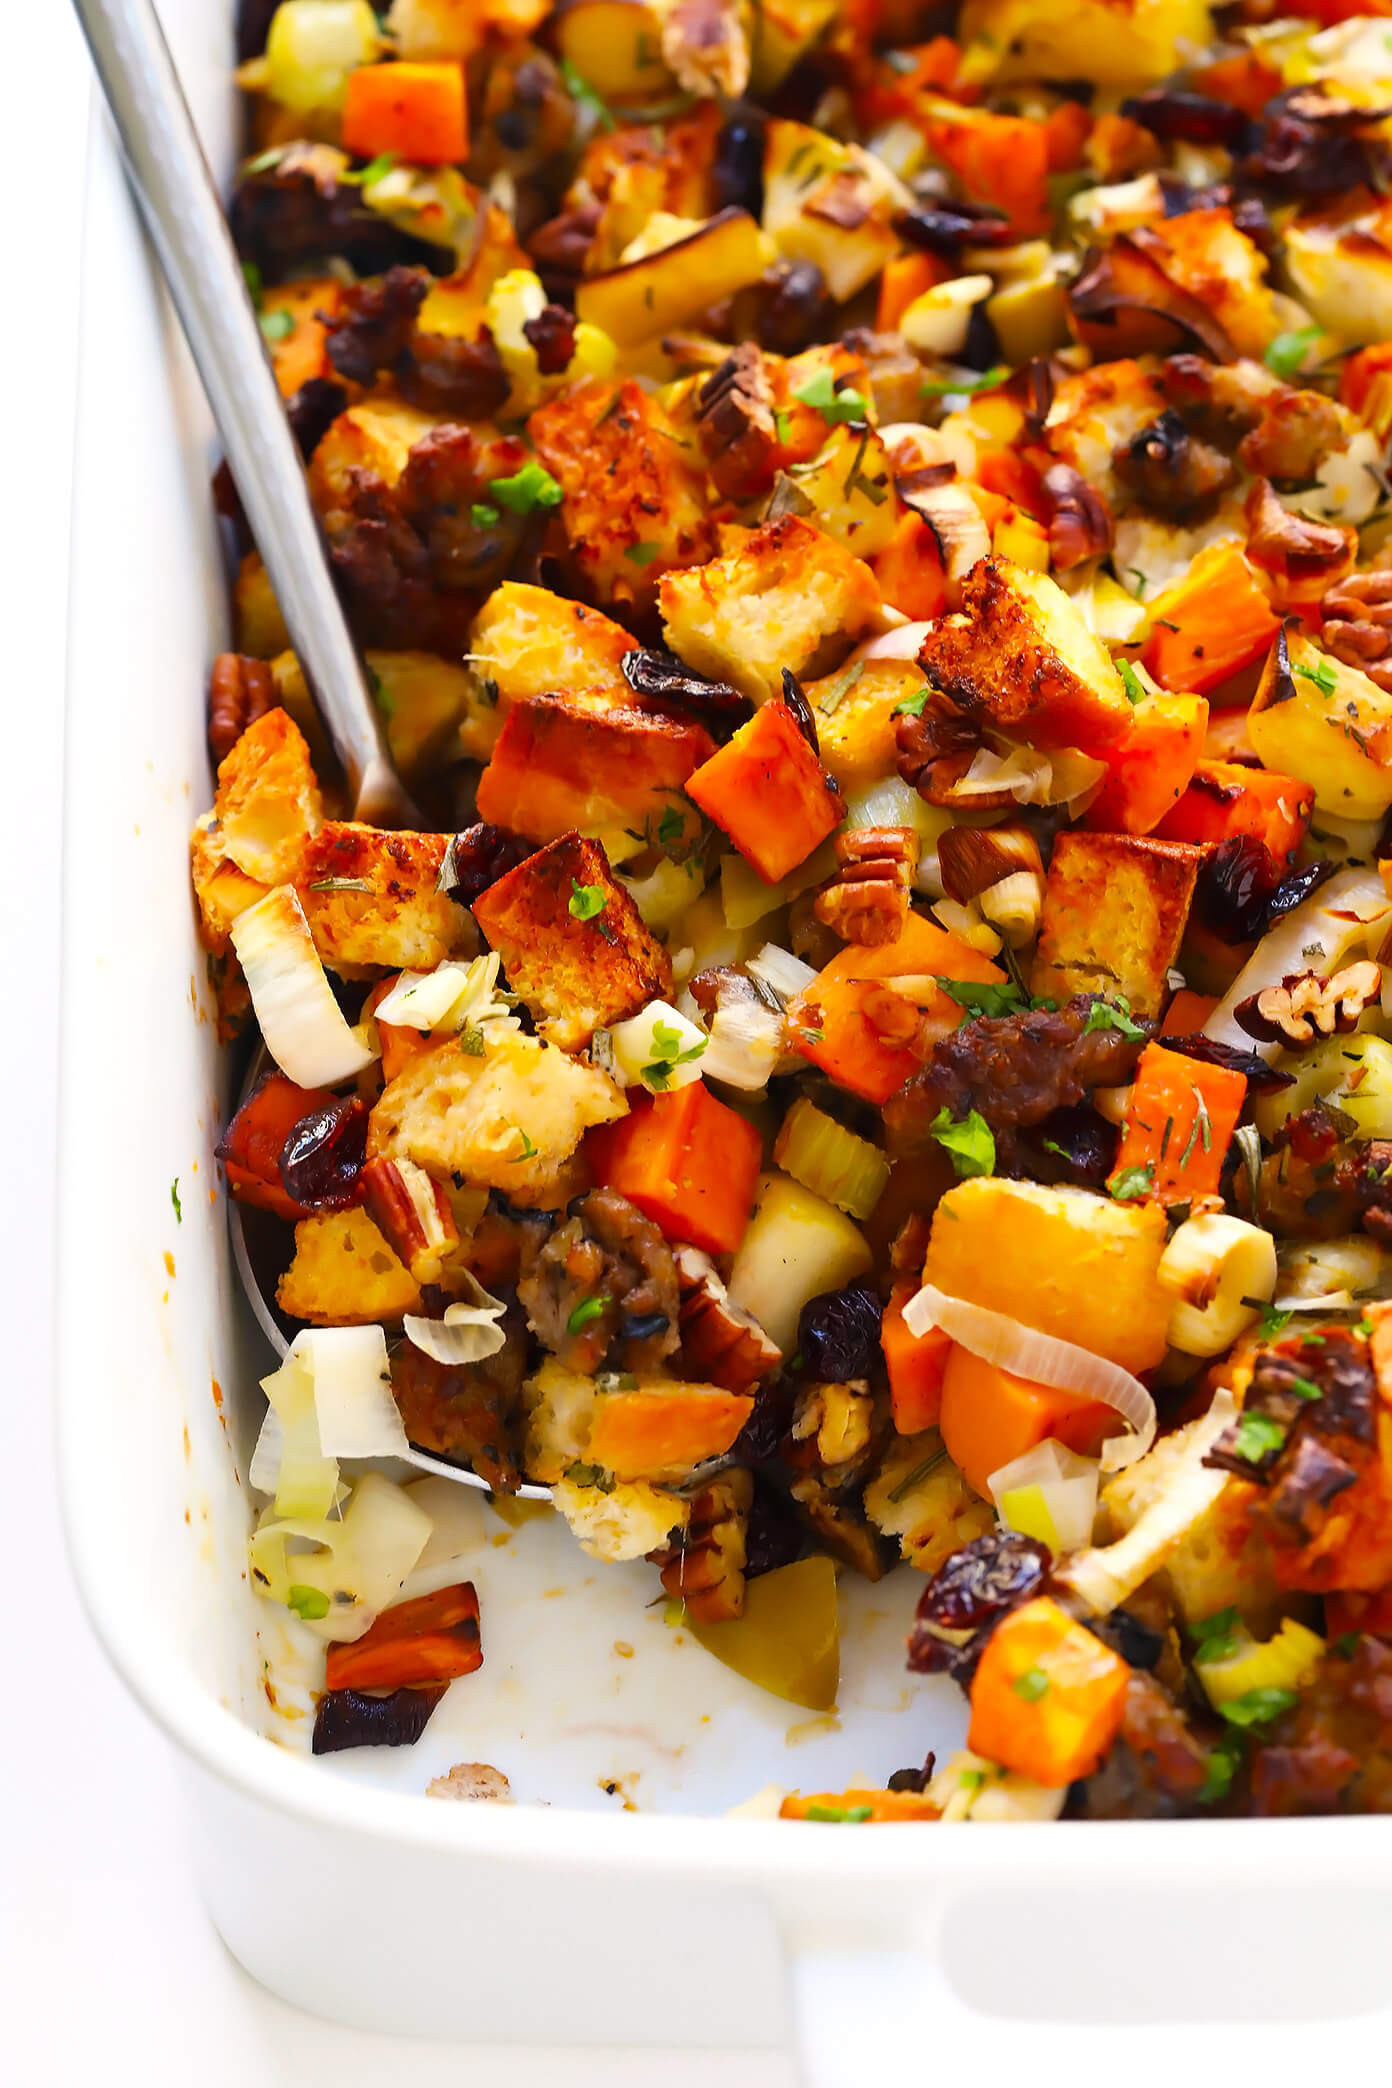 Thanksgiving Sweet Potatoes Recipe  The BEST Sausage and Sweet Potato Thanksgiving Stuffing